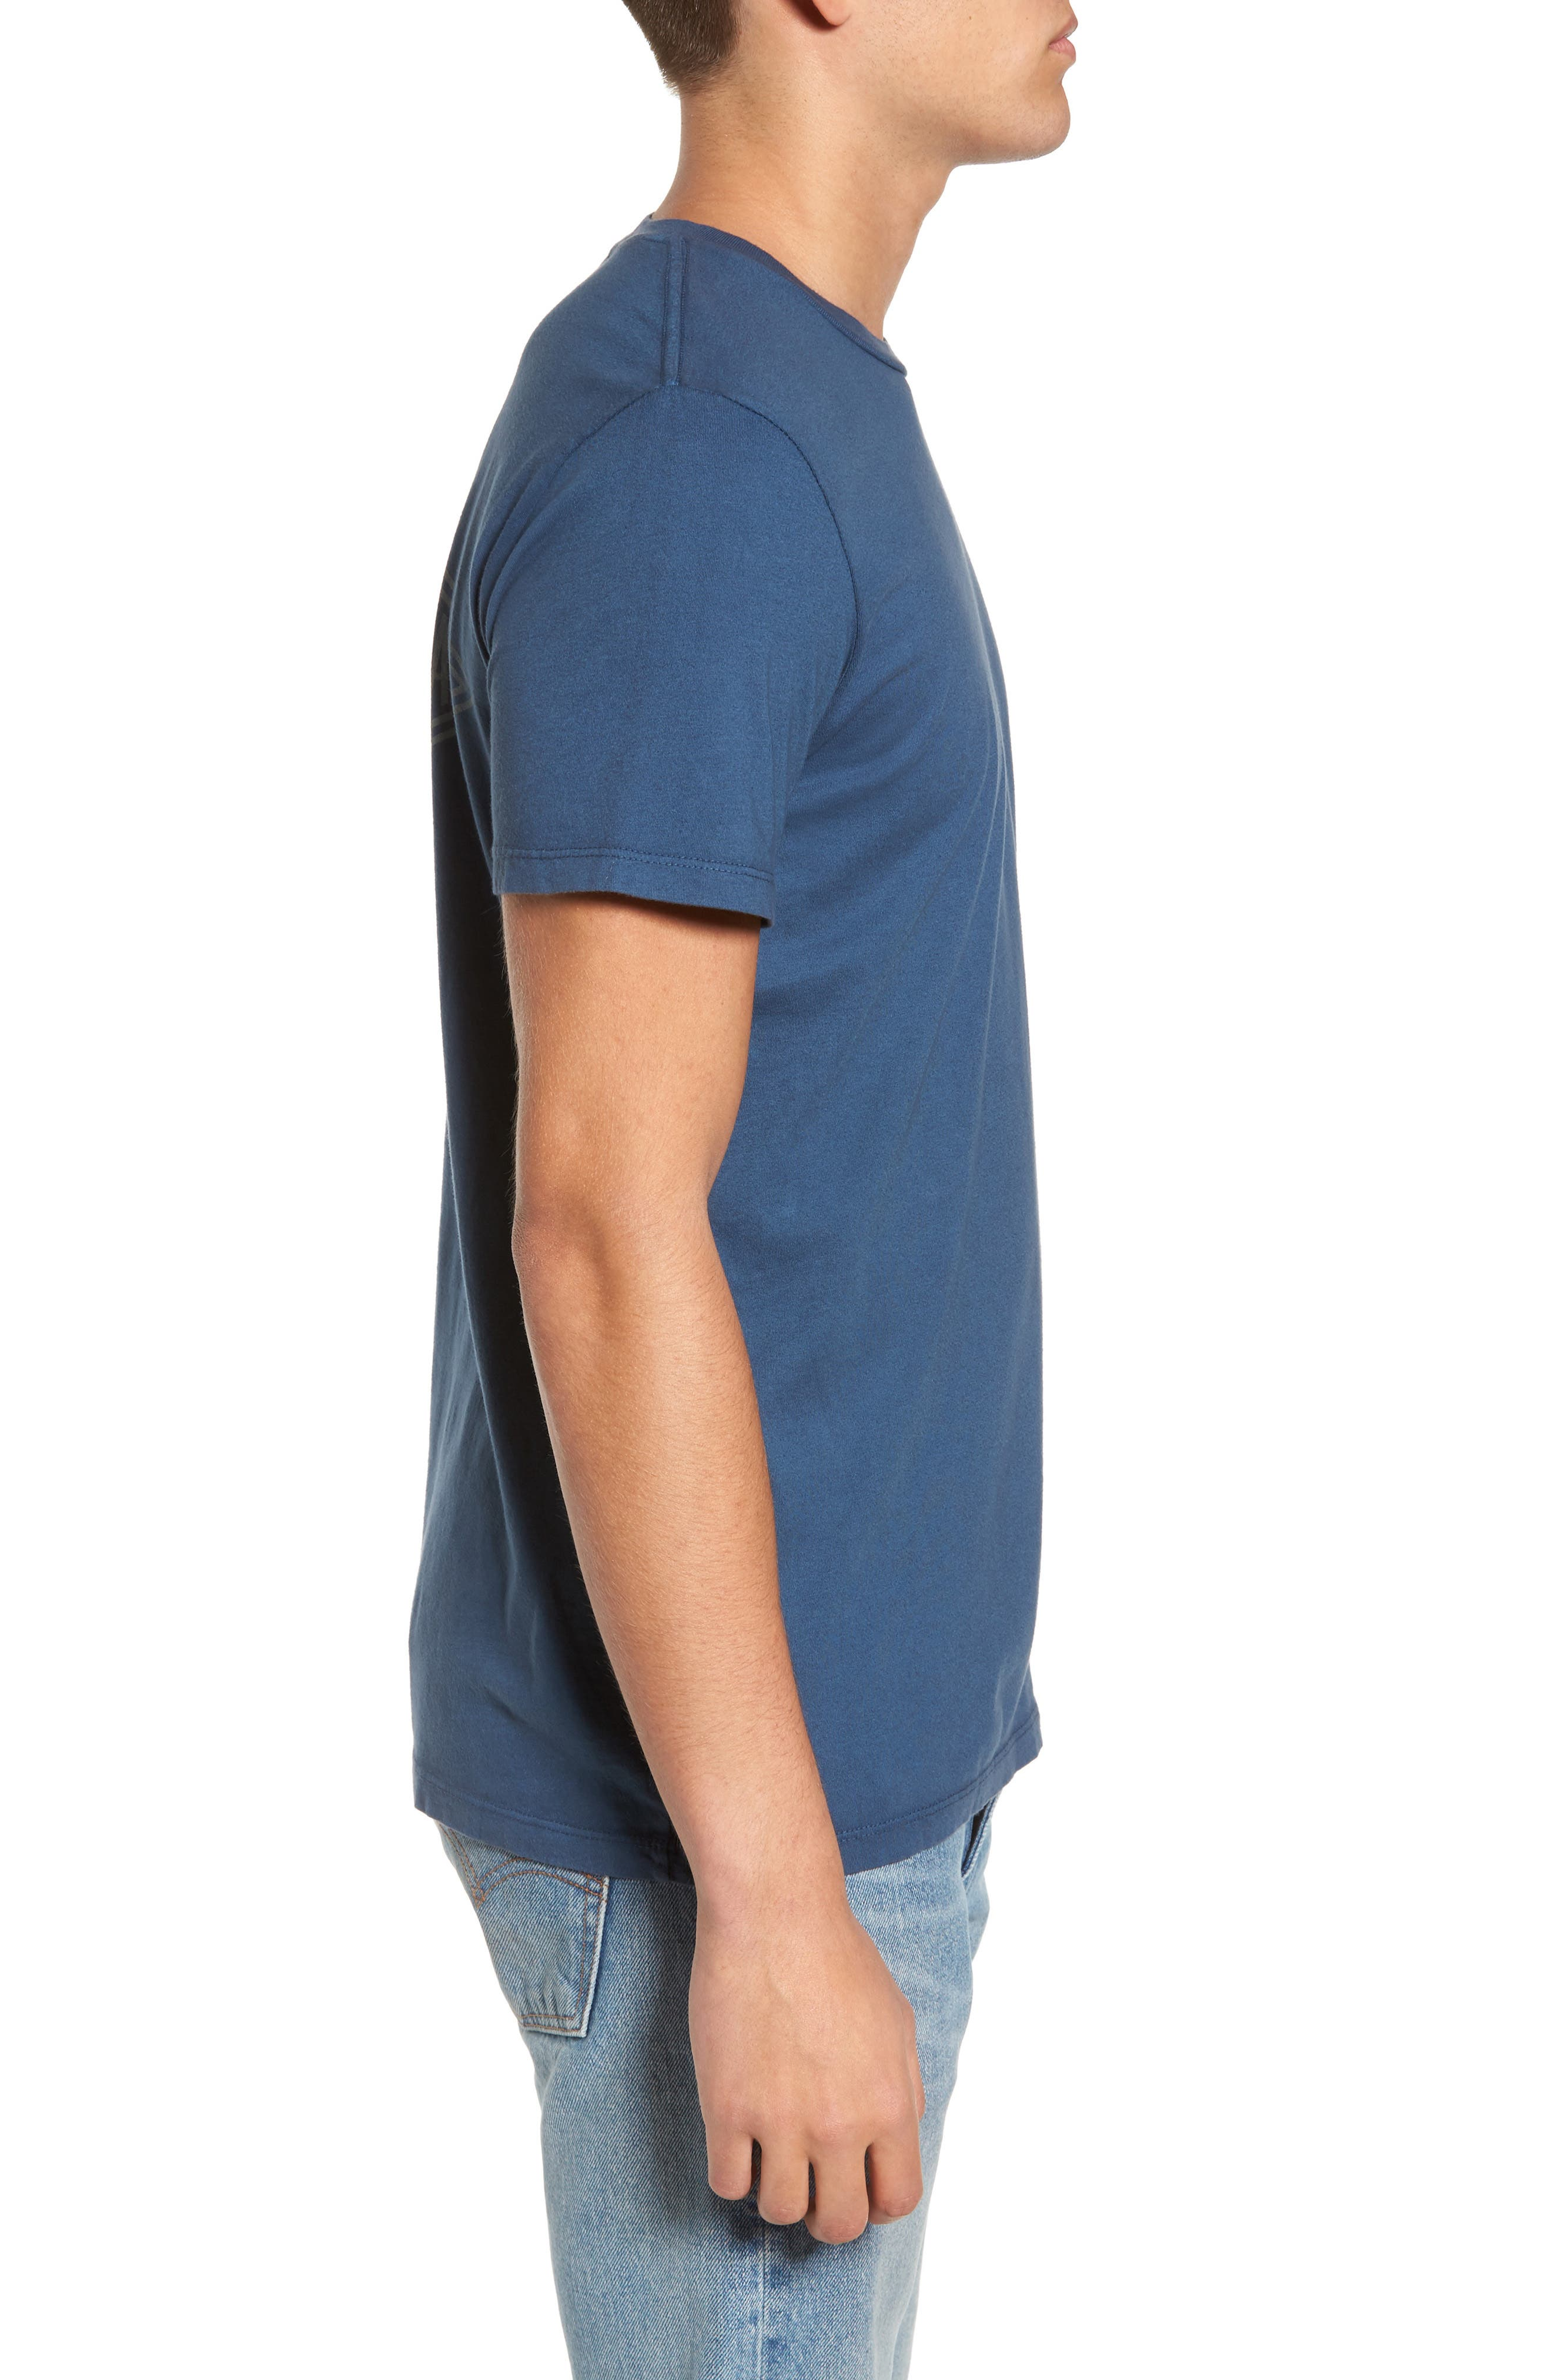 Trademark Diamond T-Shirt,                             Alternate thumbnail 3, color,                             424